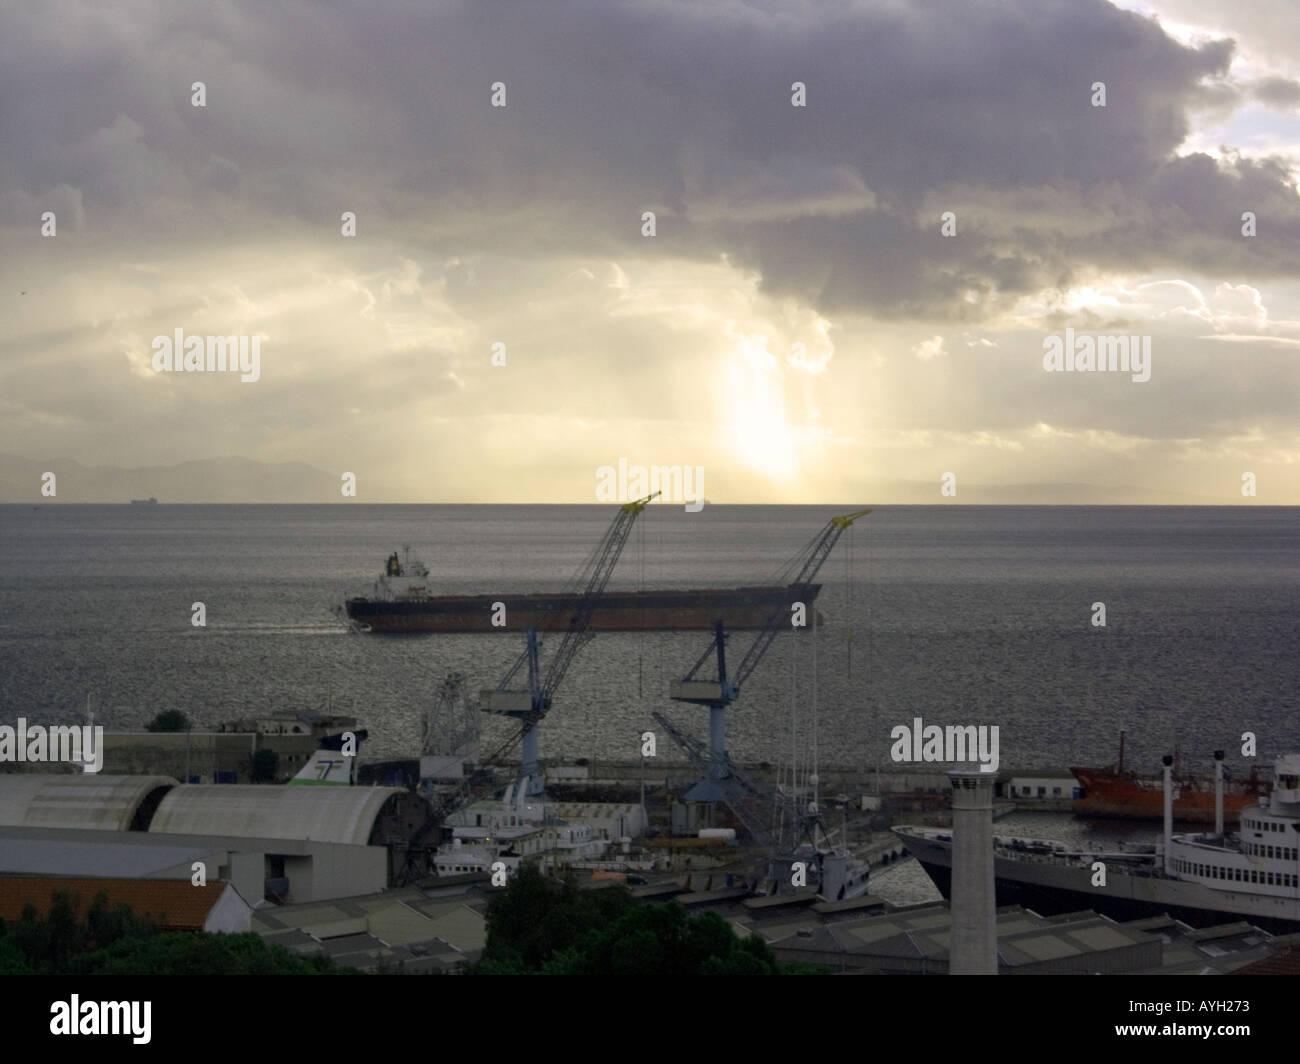 Sunset, dusk over the Bay of Gibraltar, shipyard shipyards sunset sunsets dusk evening nightfall  Gibraltar Harbour - Stock Image